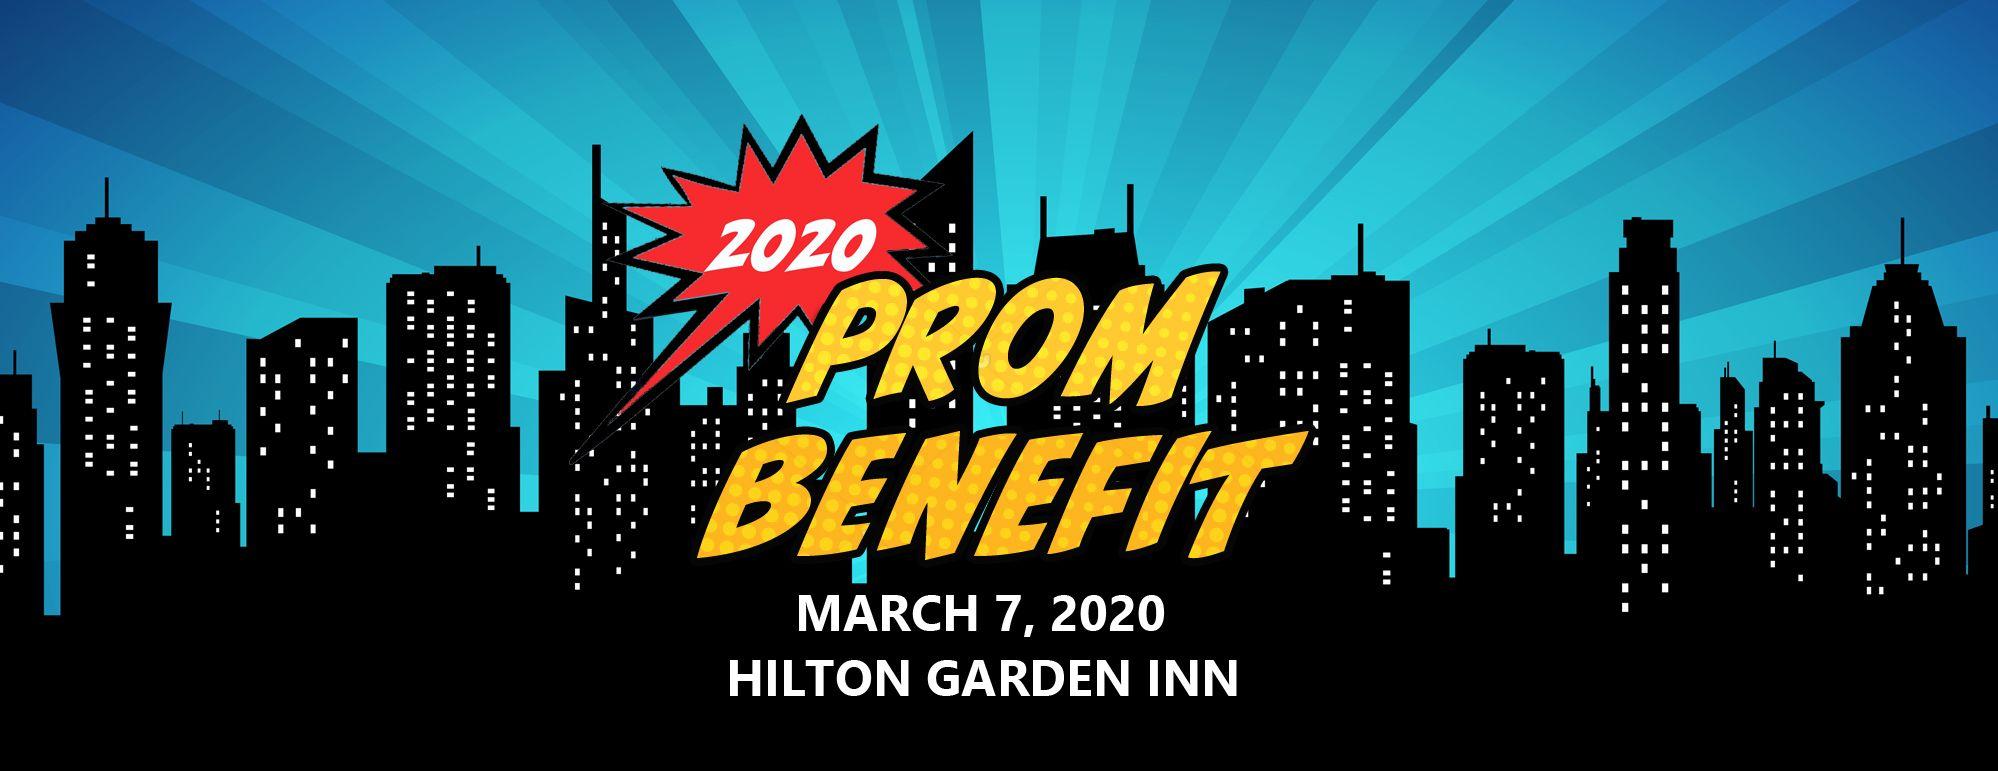 Prom Benefit